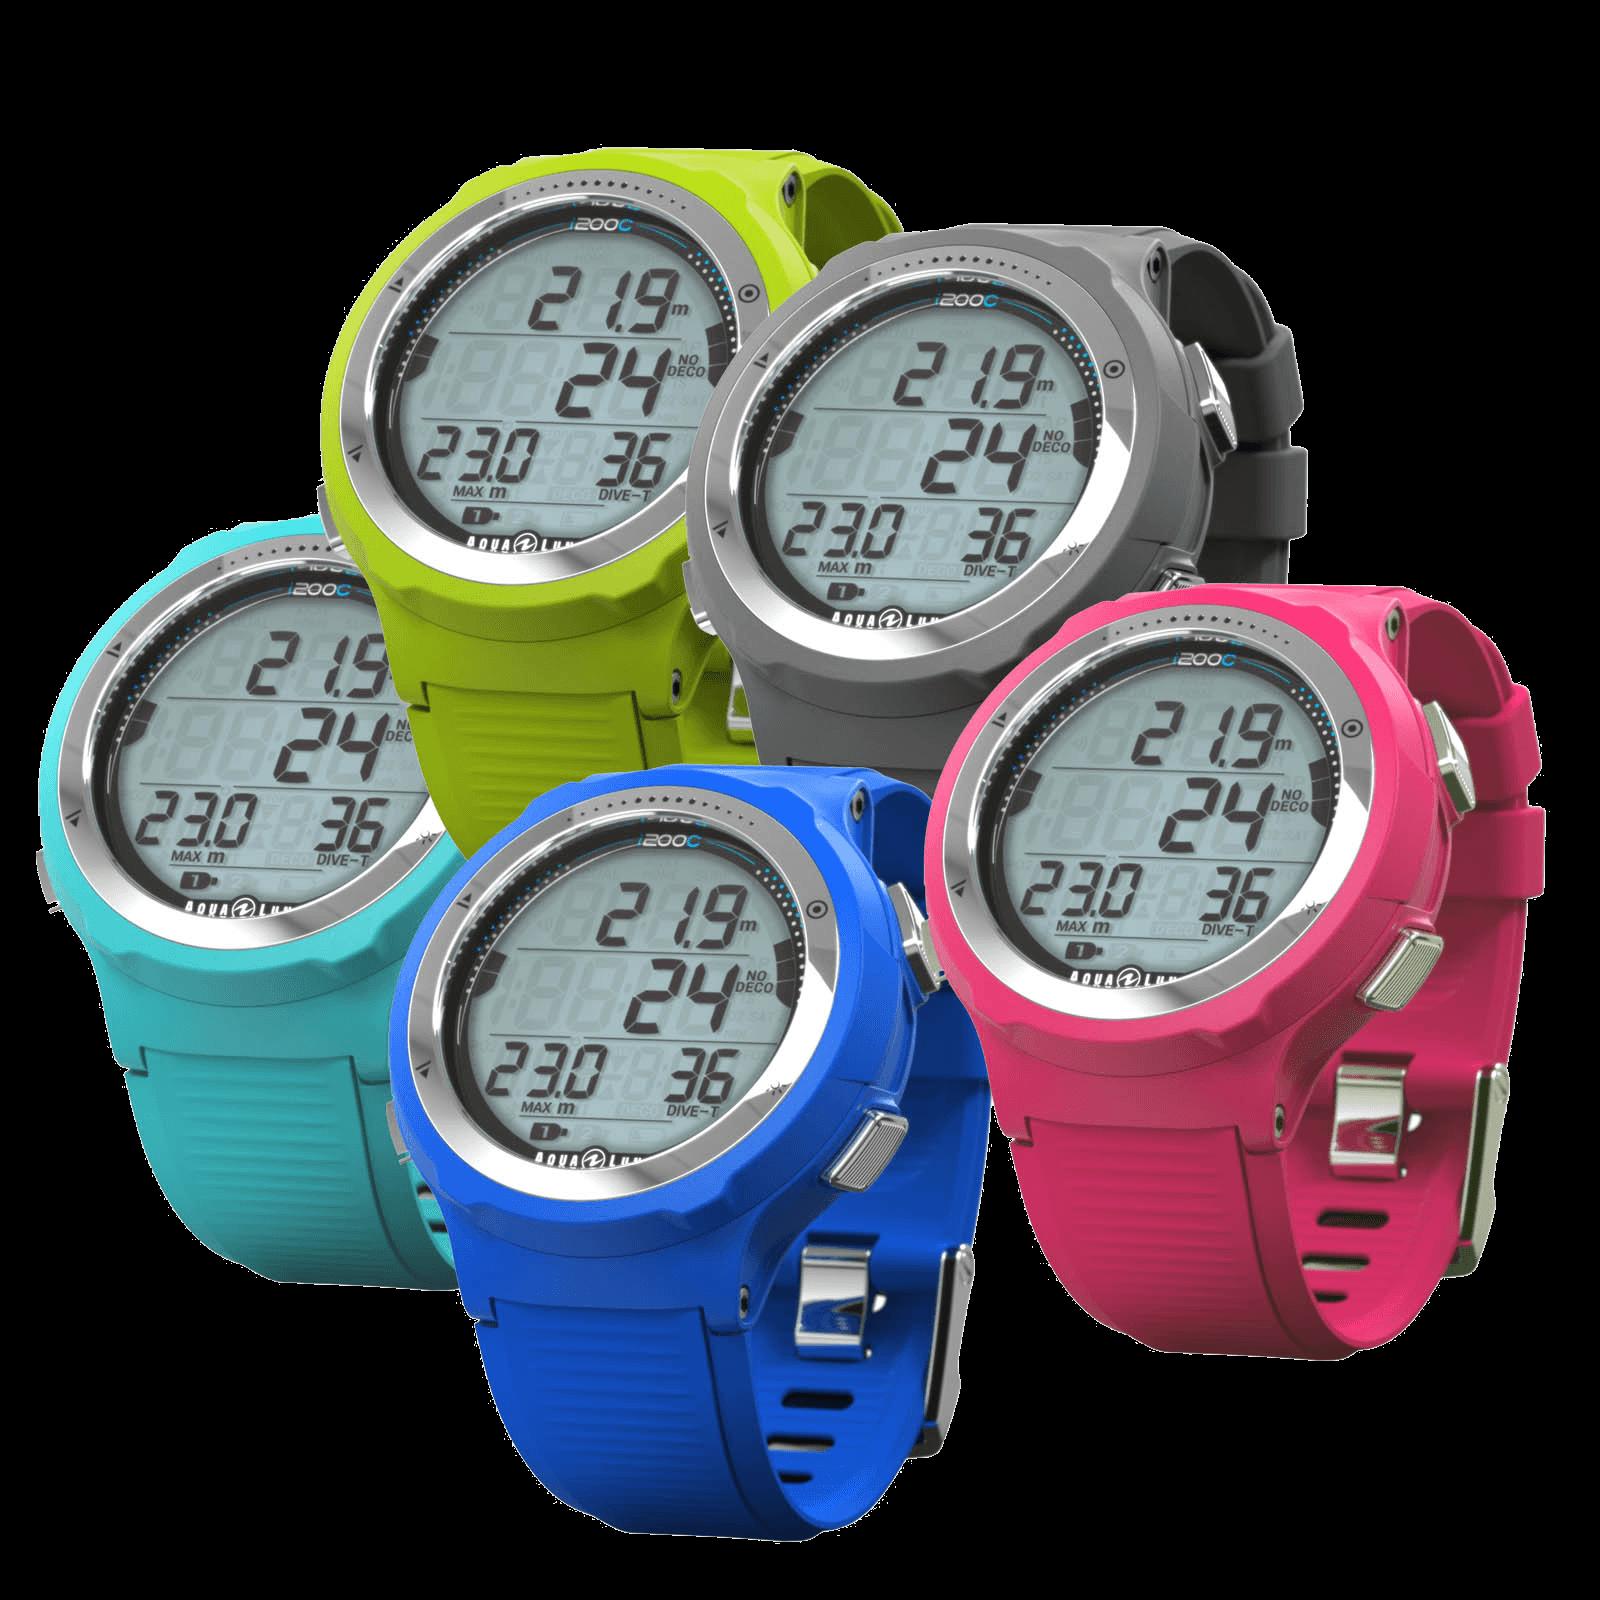 I200C Wrist Computer - Assorted Colors